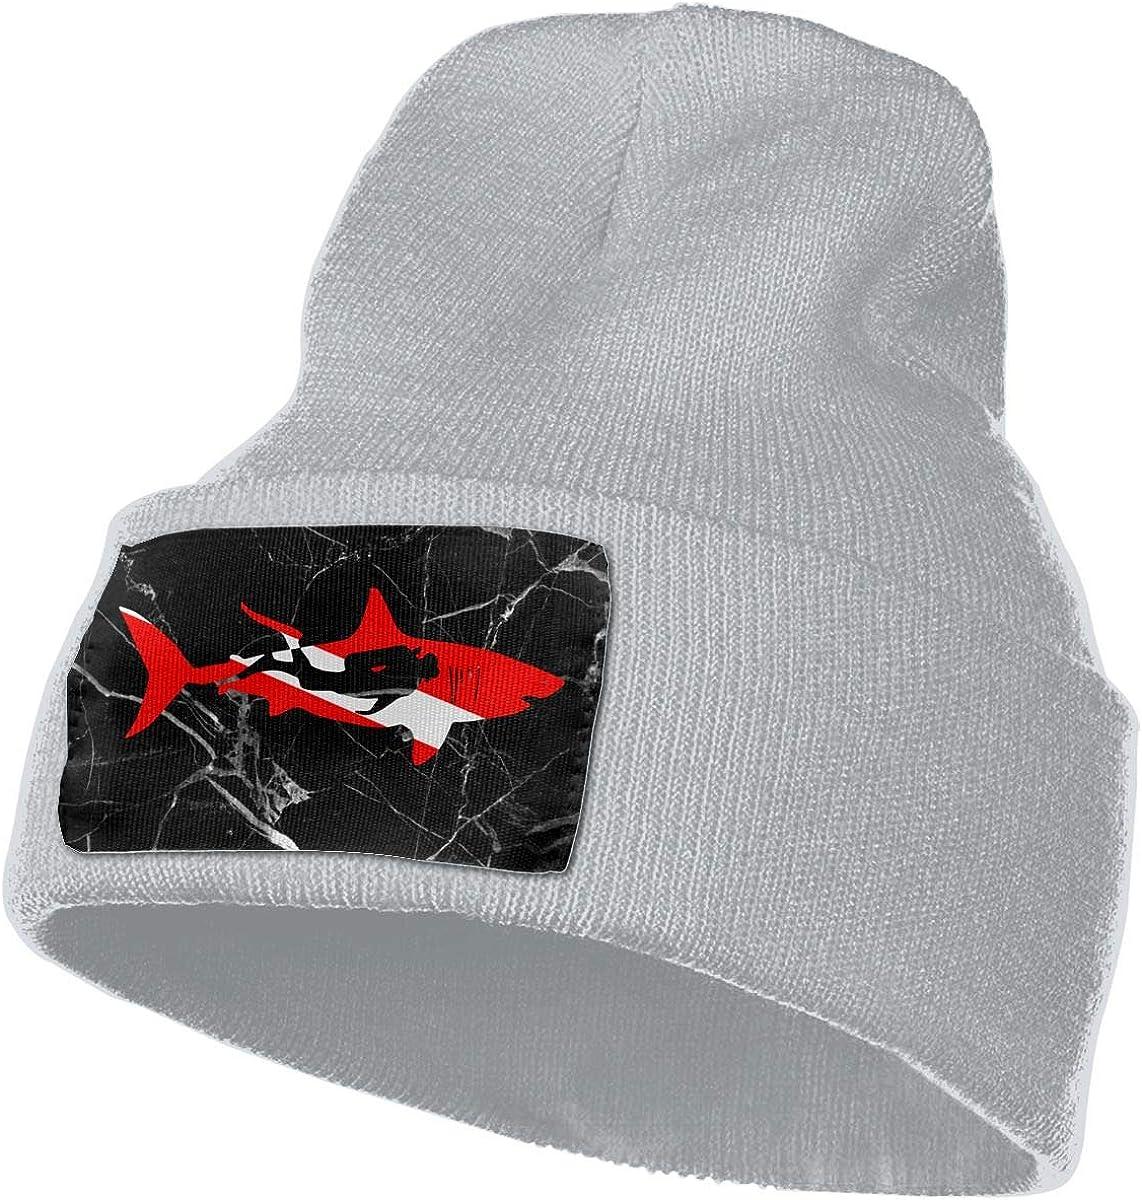 Shark Diver Diving Ski Cap Men Women Knitting Hats Stretchy & Soft Beanie